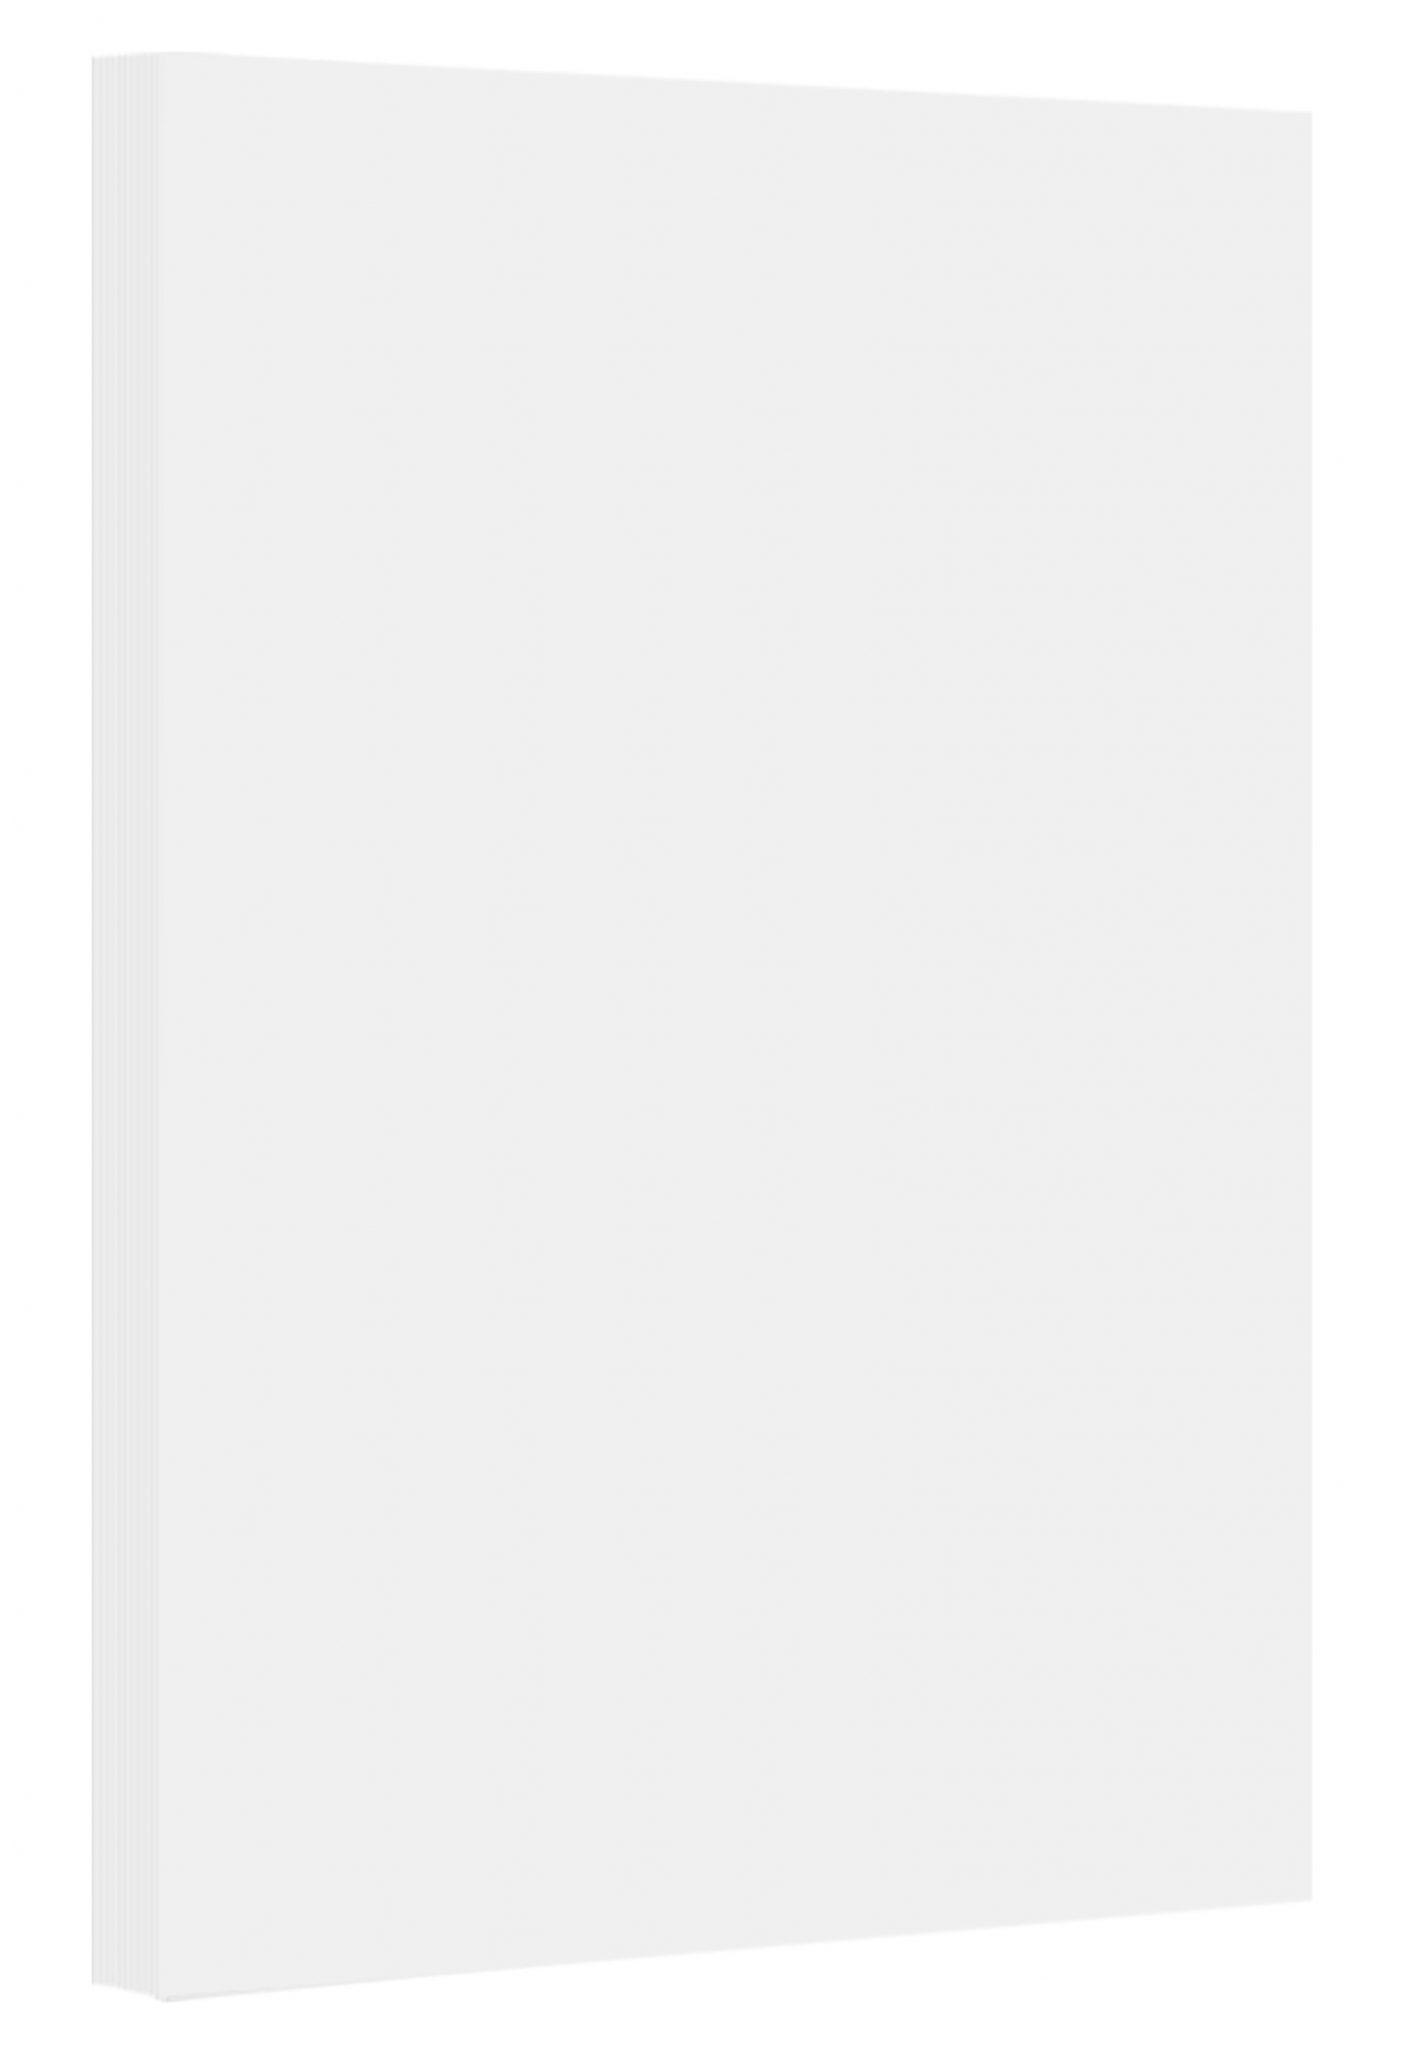 8.5 x 14 Legal Menu Size Cardstock